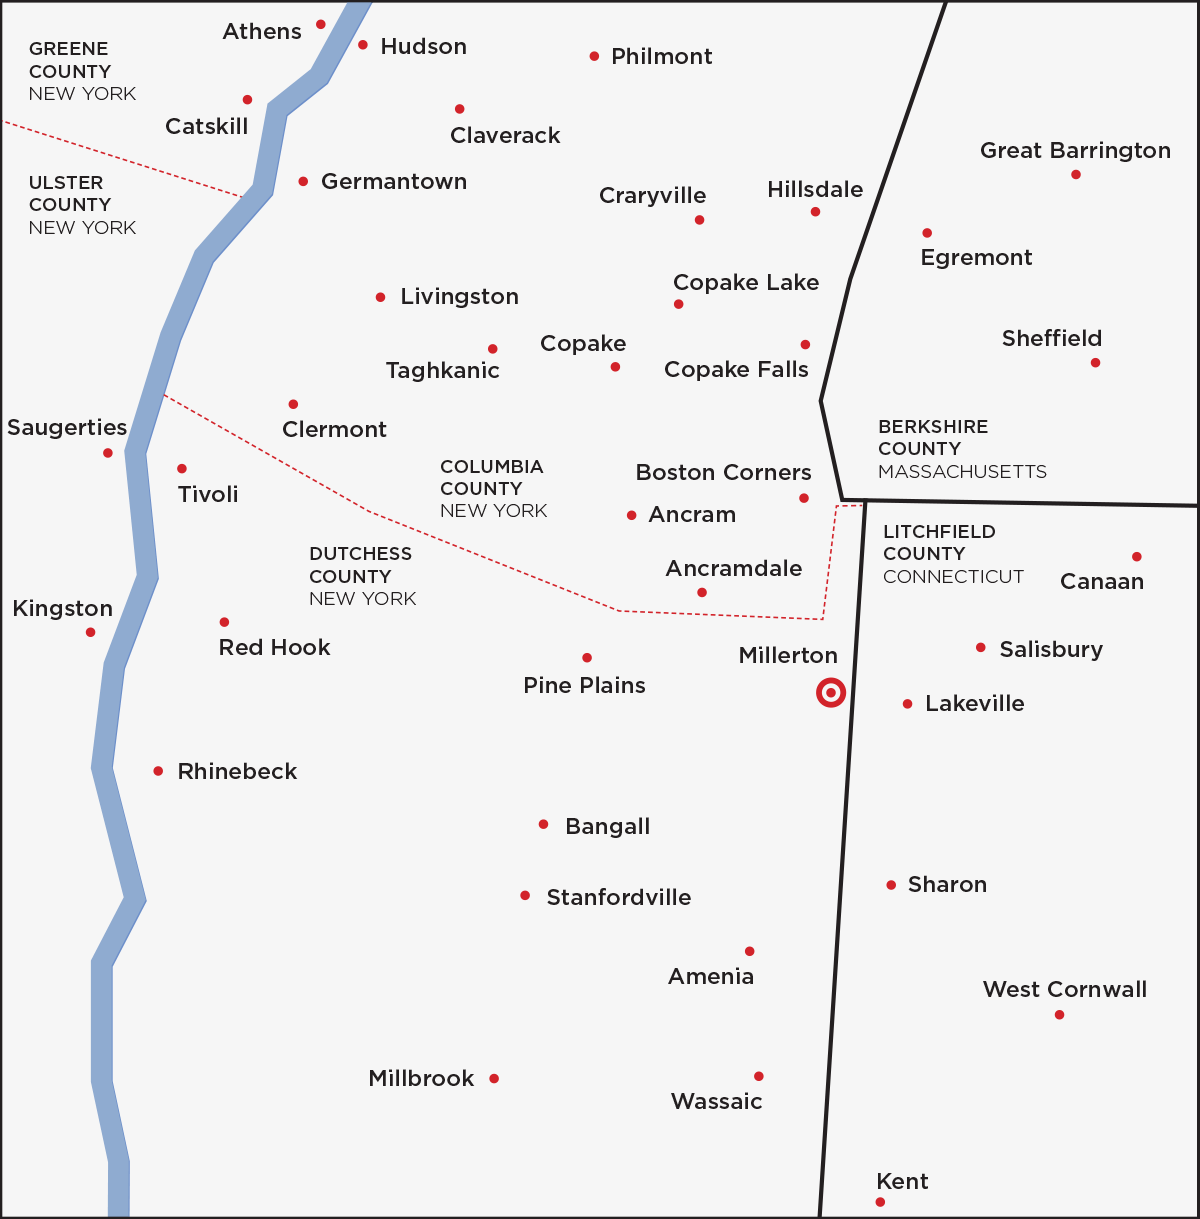 Main Street Magazine's Distribution Map